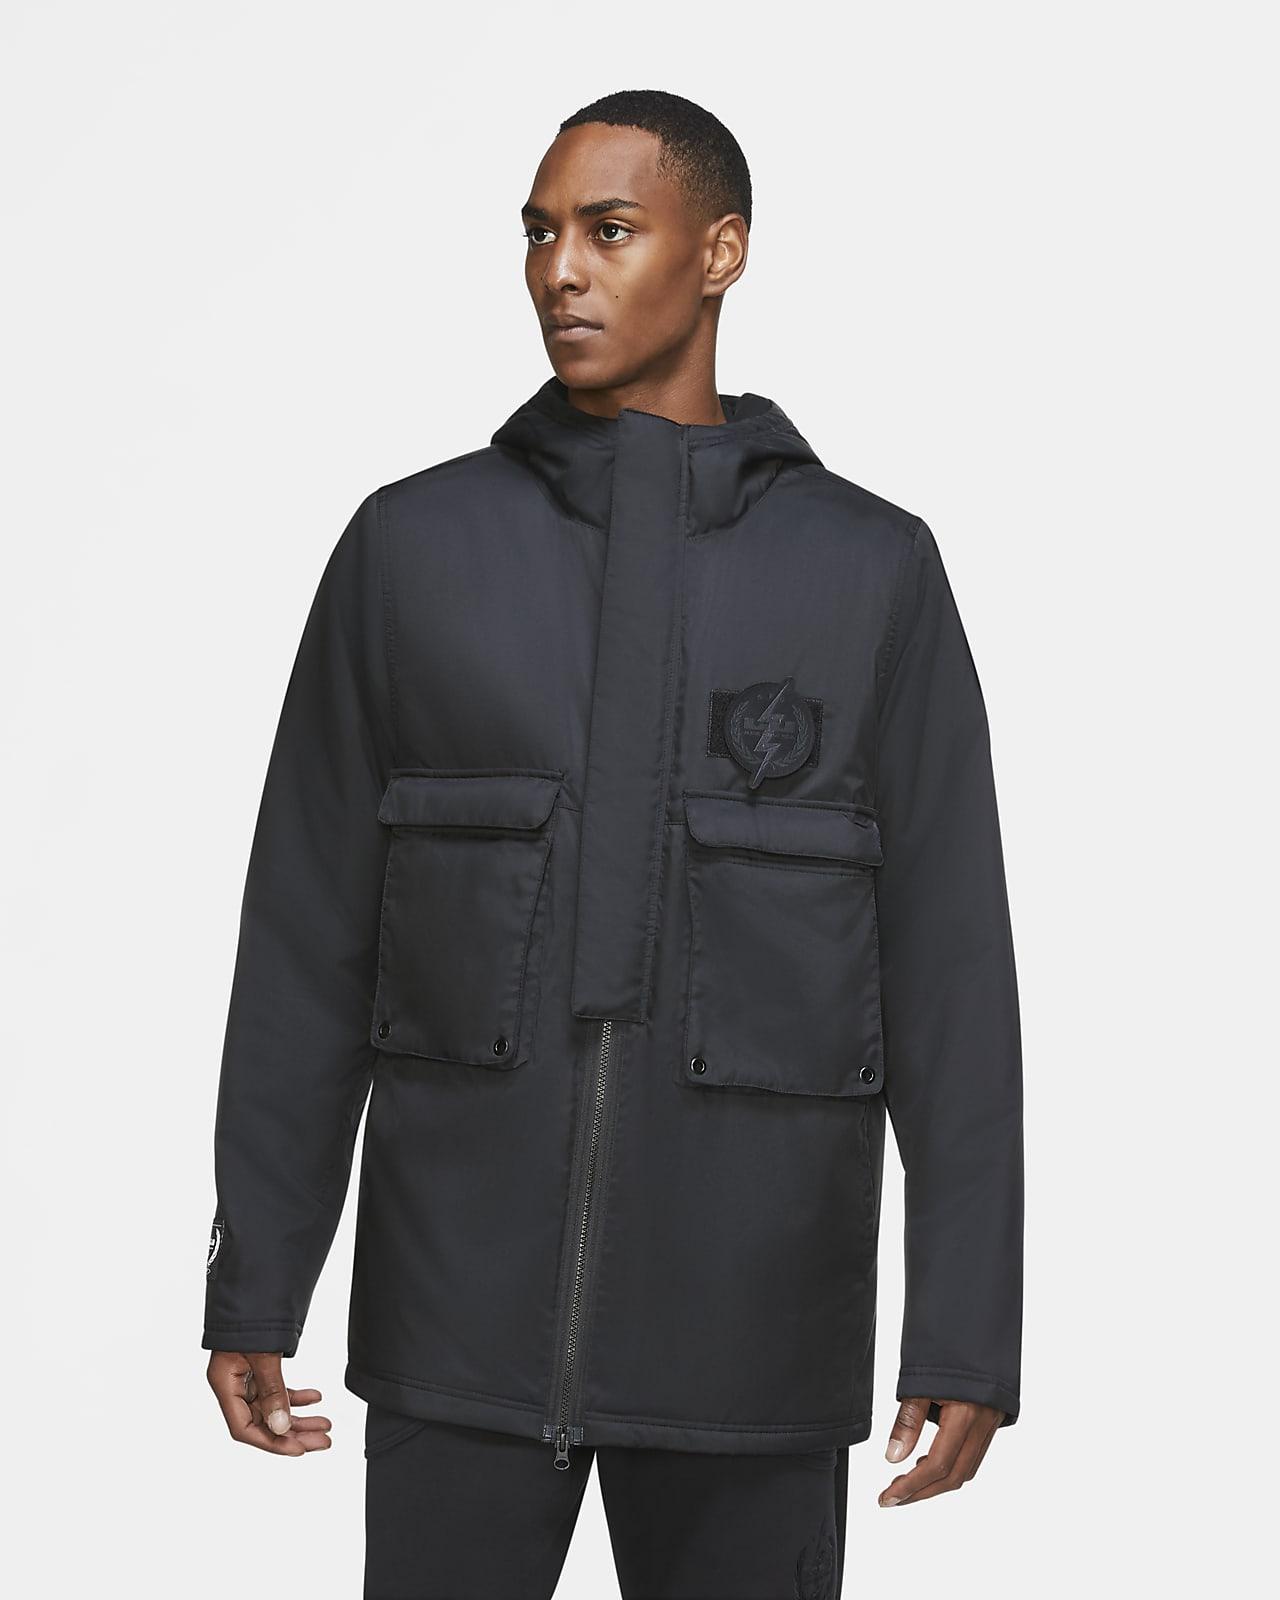 LeBron Men's Basketball Jacket